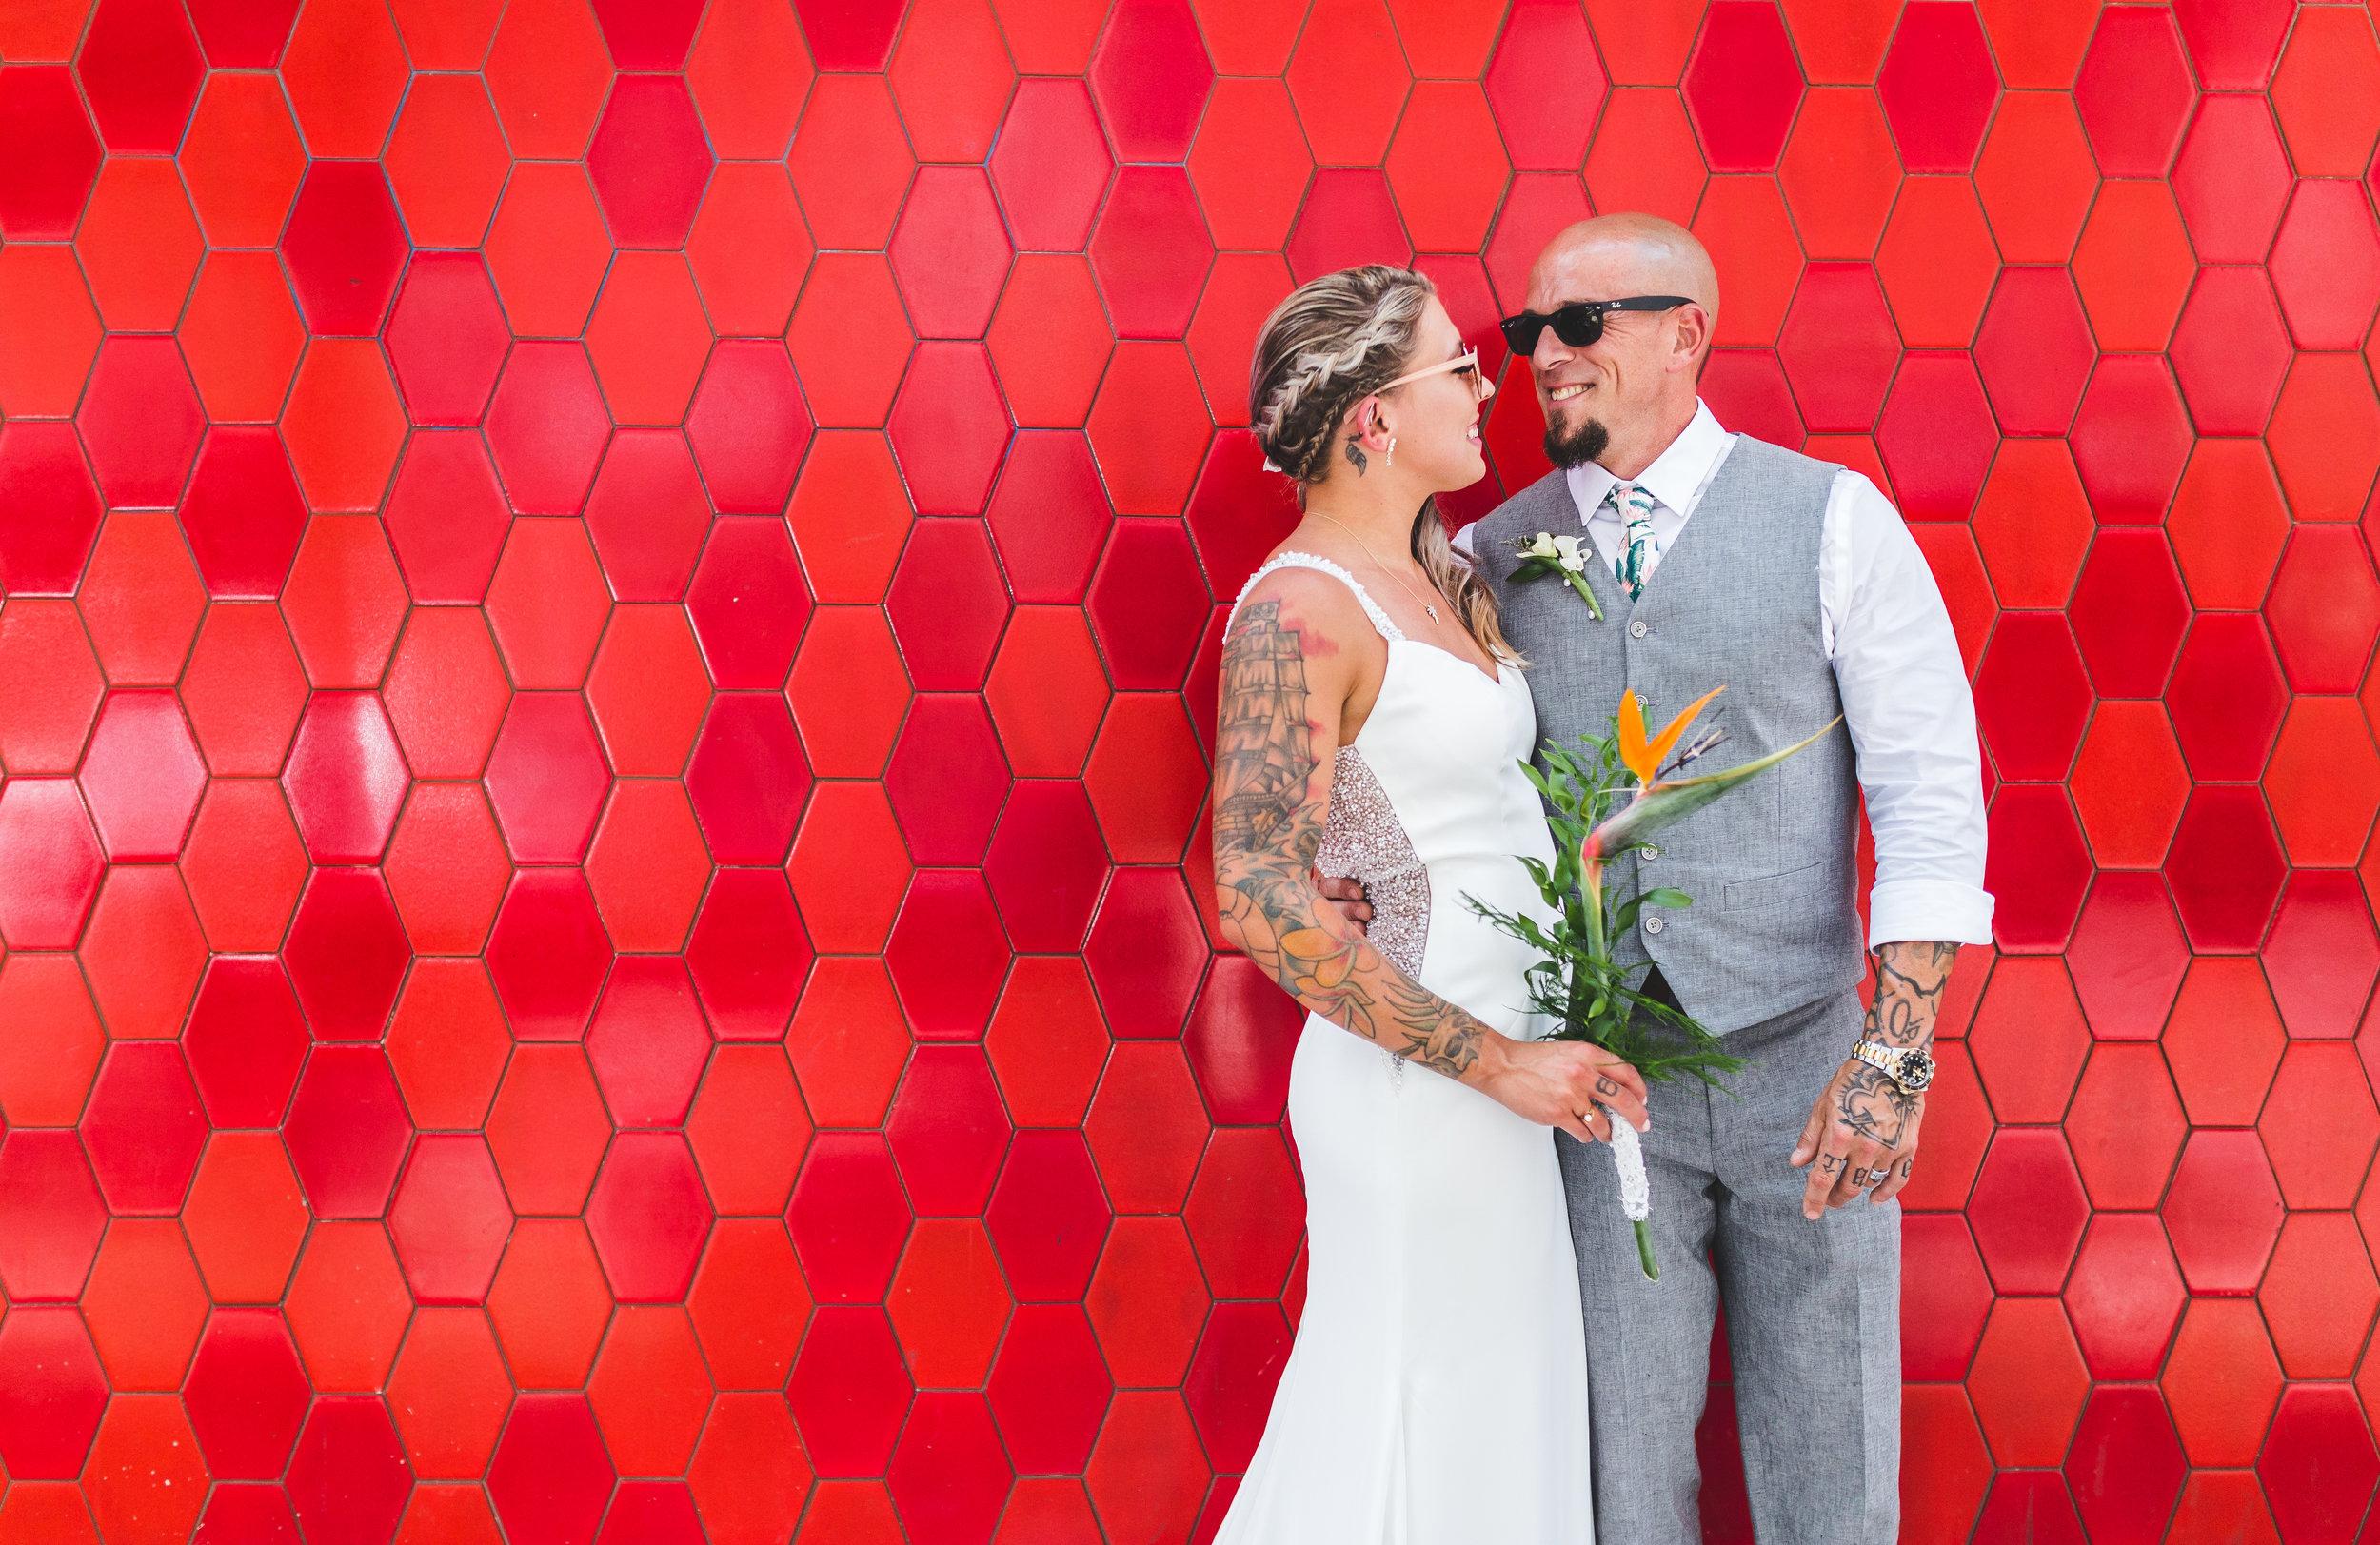 2018_MAXX KRISTEN WEDDING_POSED-3.jpg